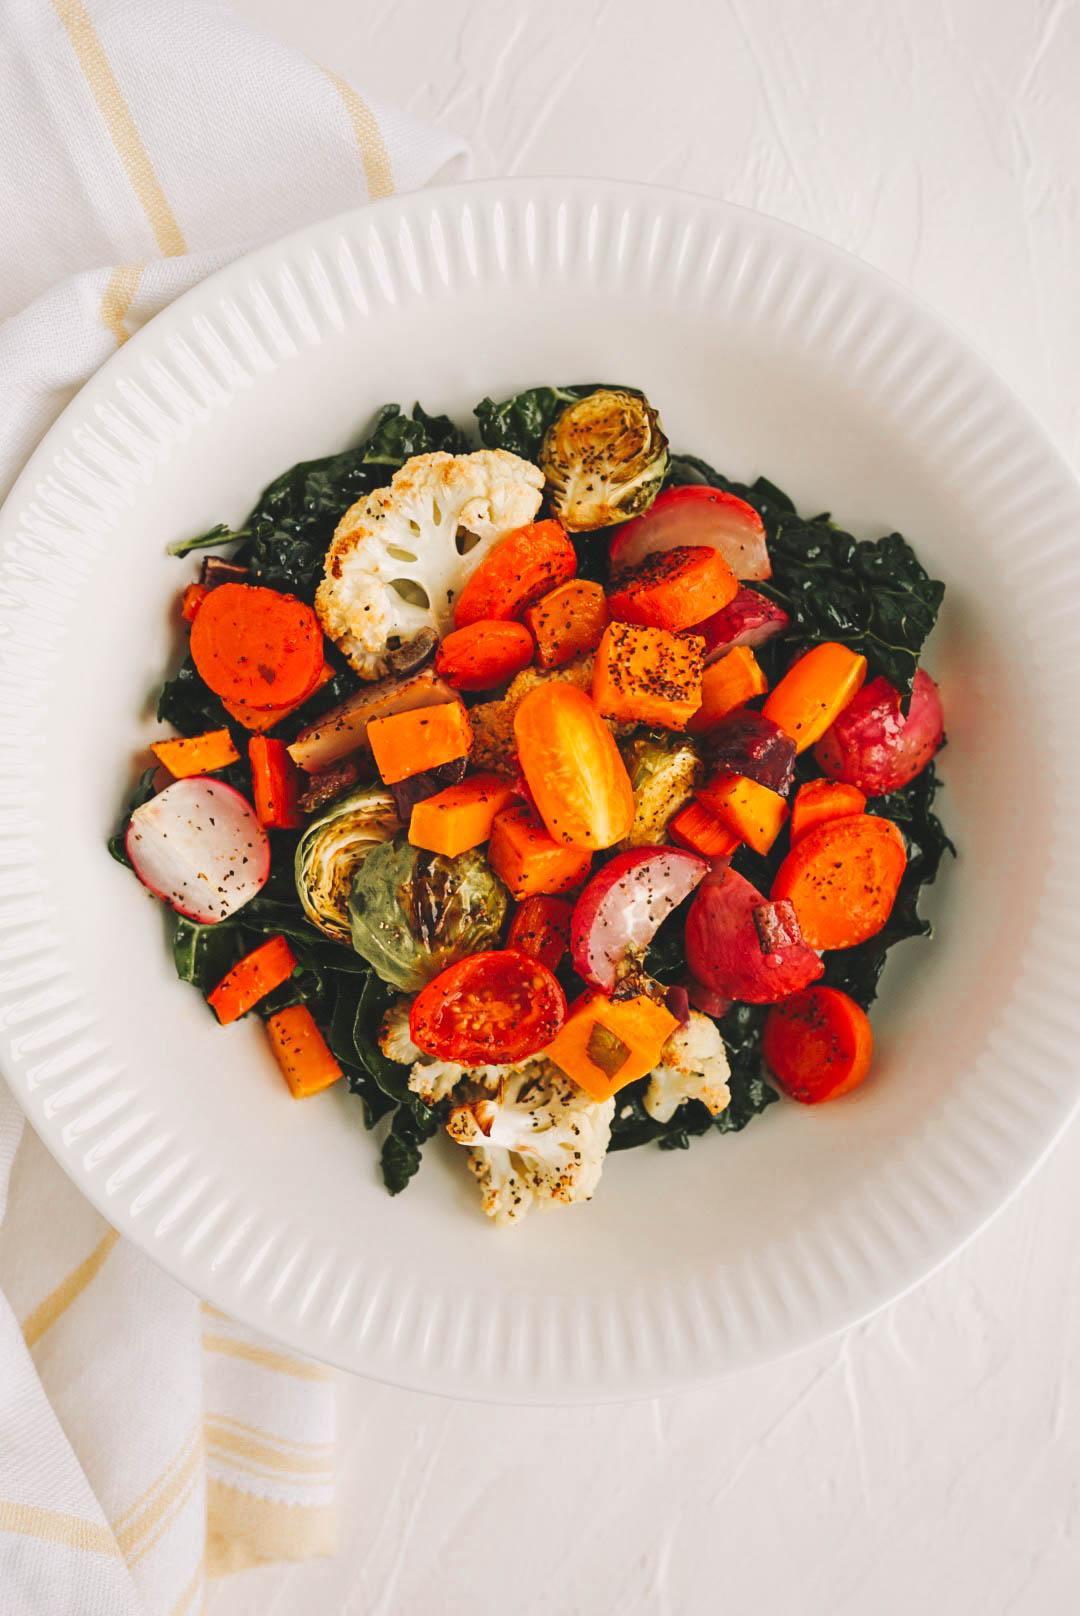 oven roasted vegetables on kale salad in white bowl